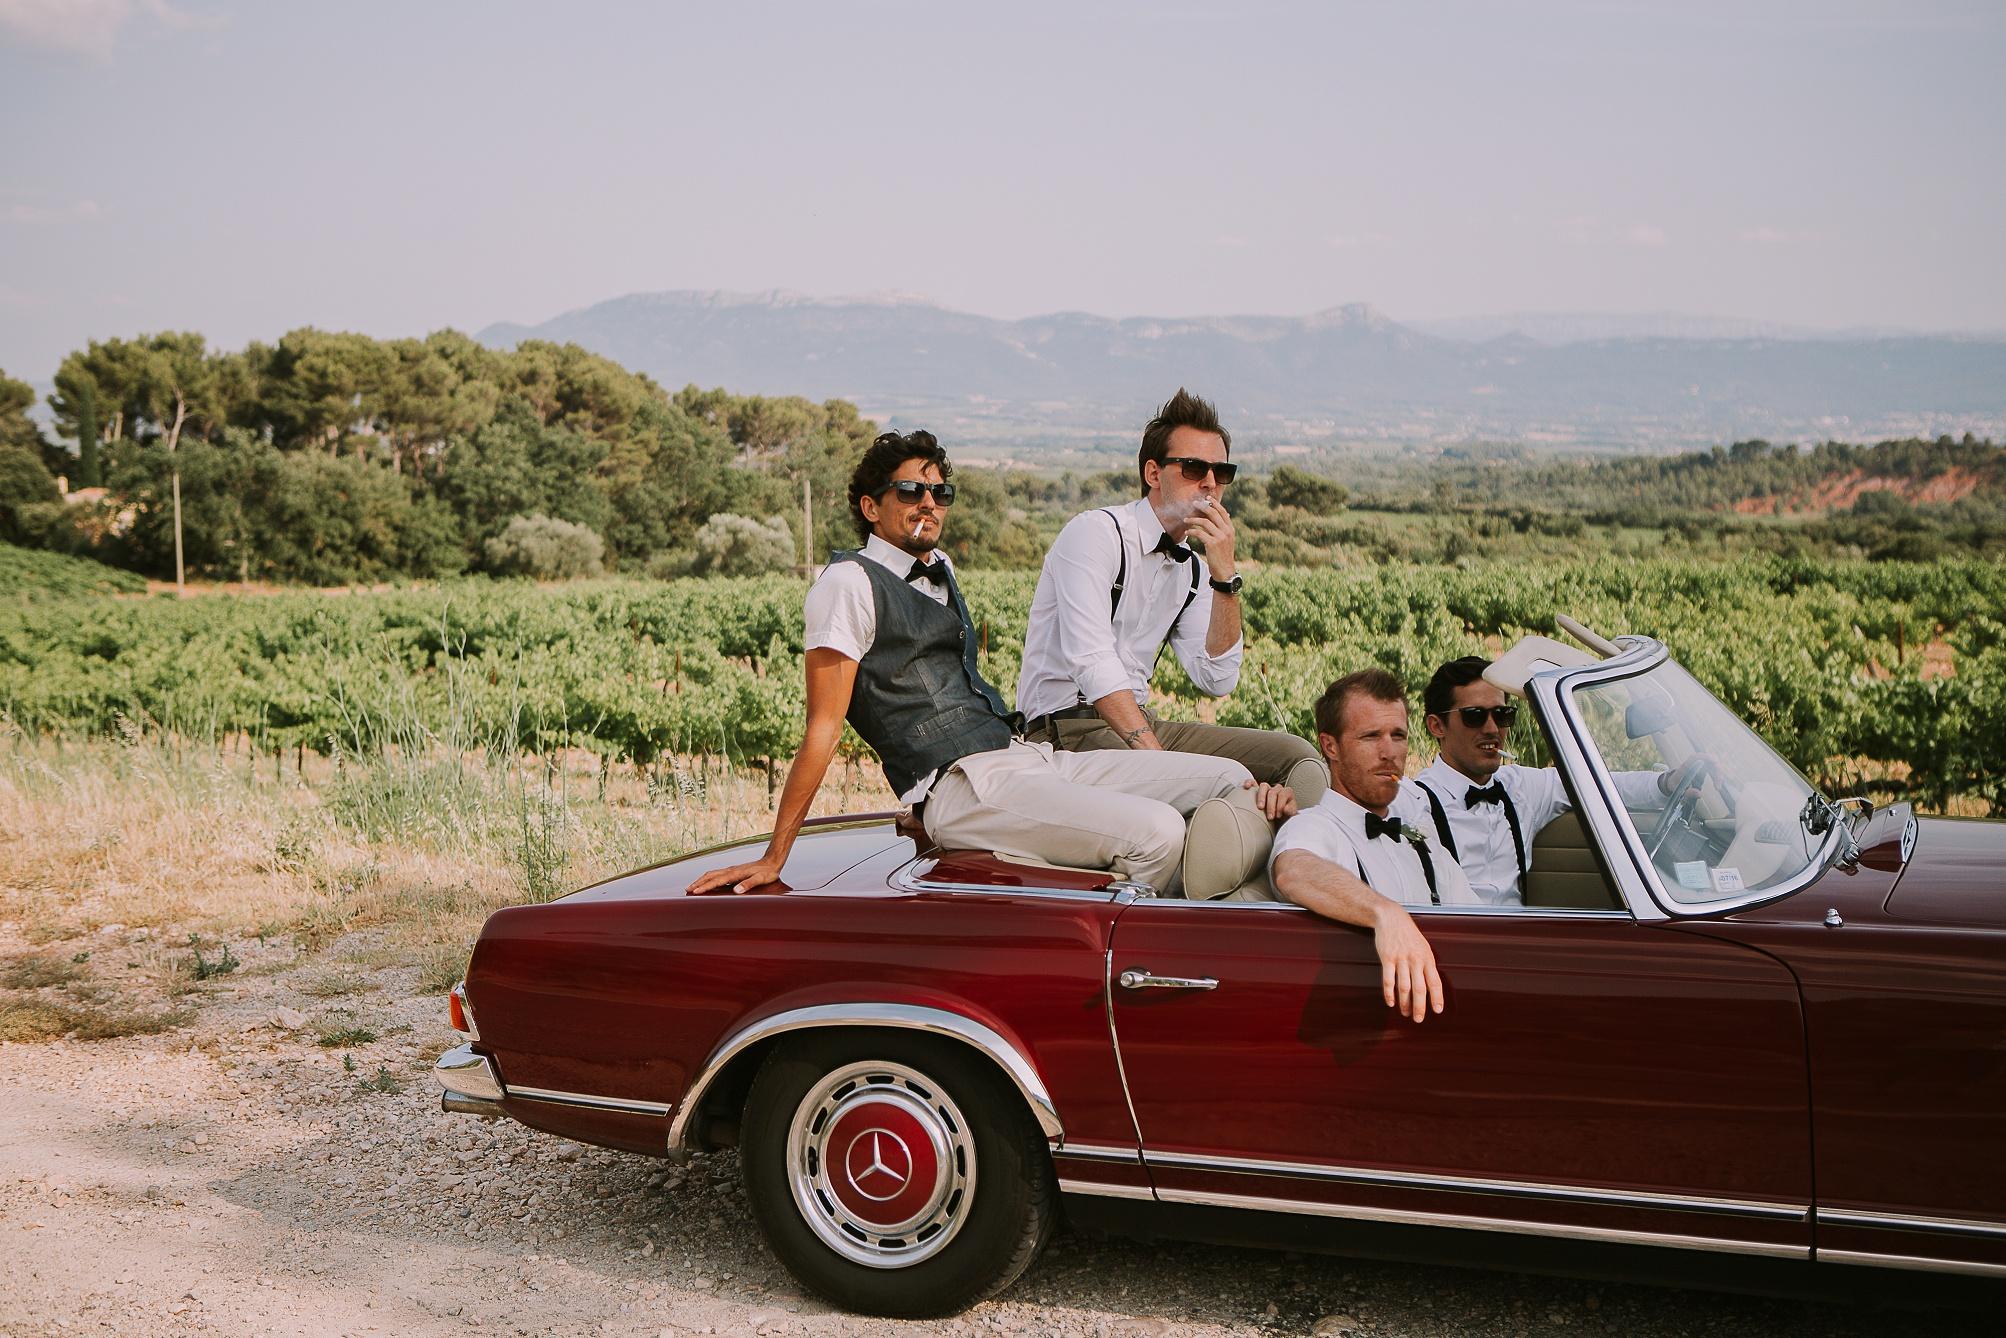 katerynaphotos-mariage-photographe-puyloubier-provence-aix-en-provence-sud-de-la-france_0392.jpg